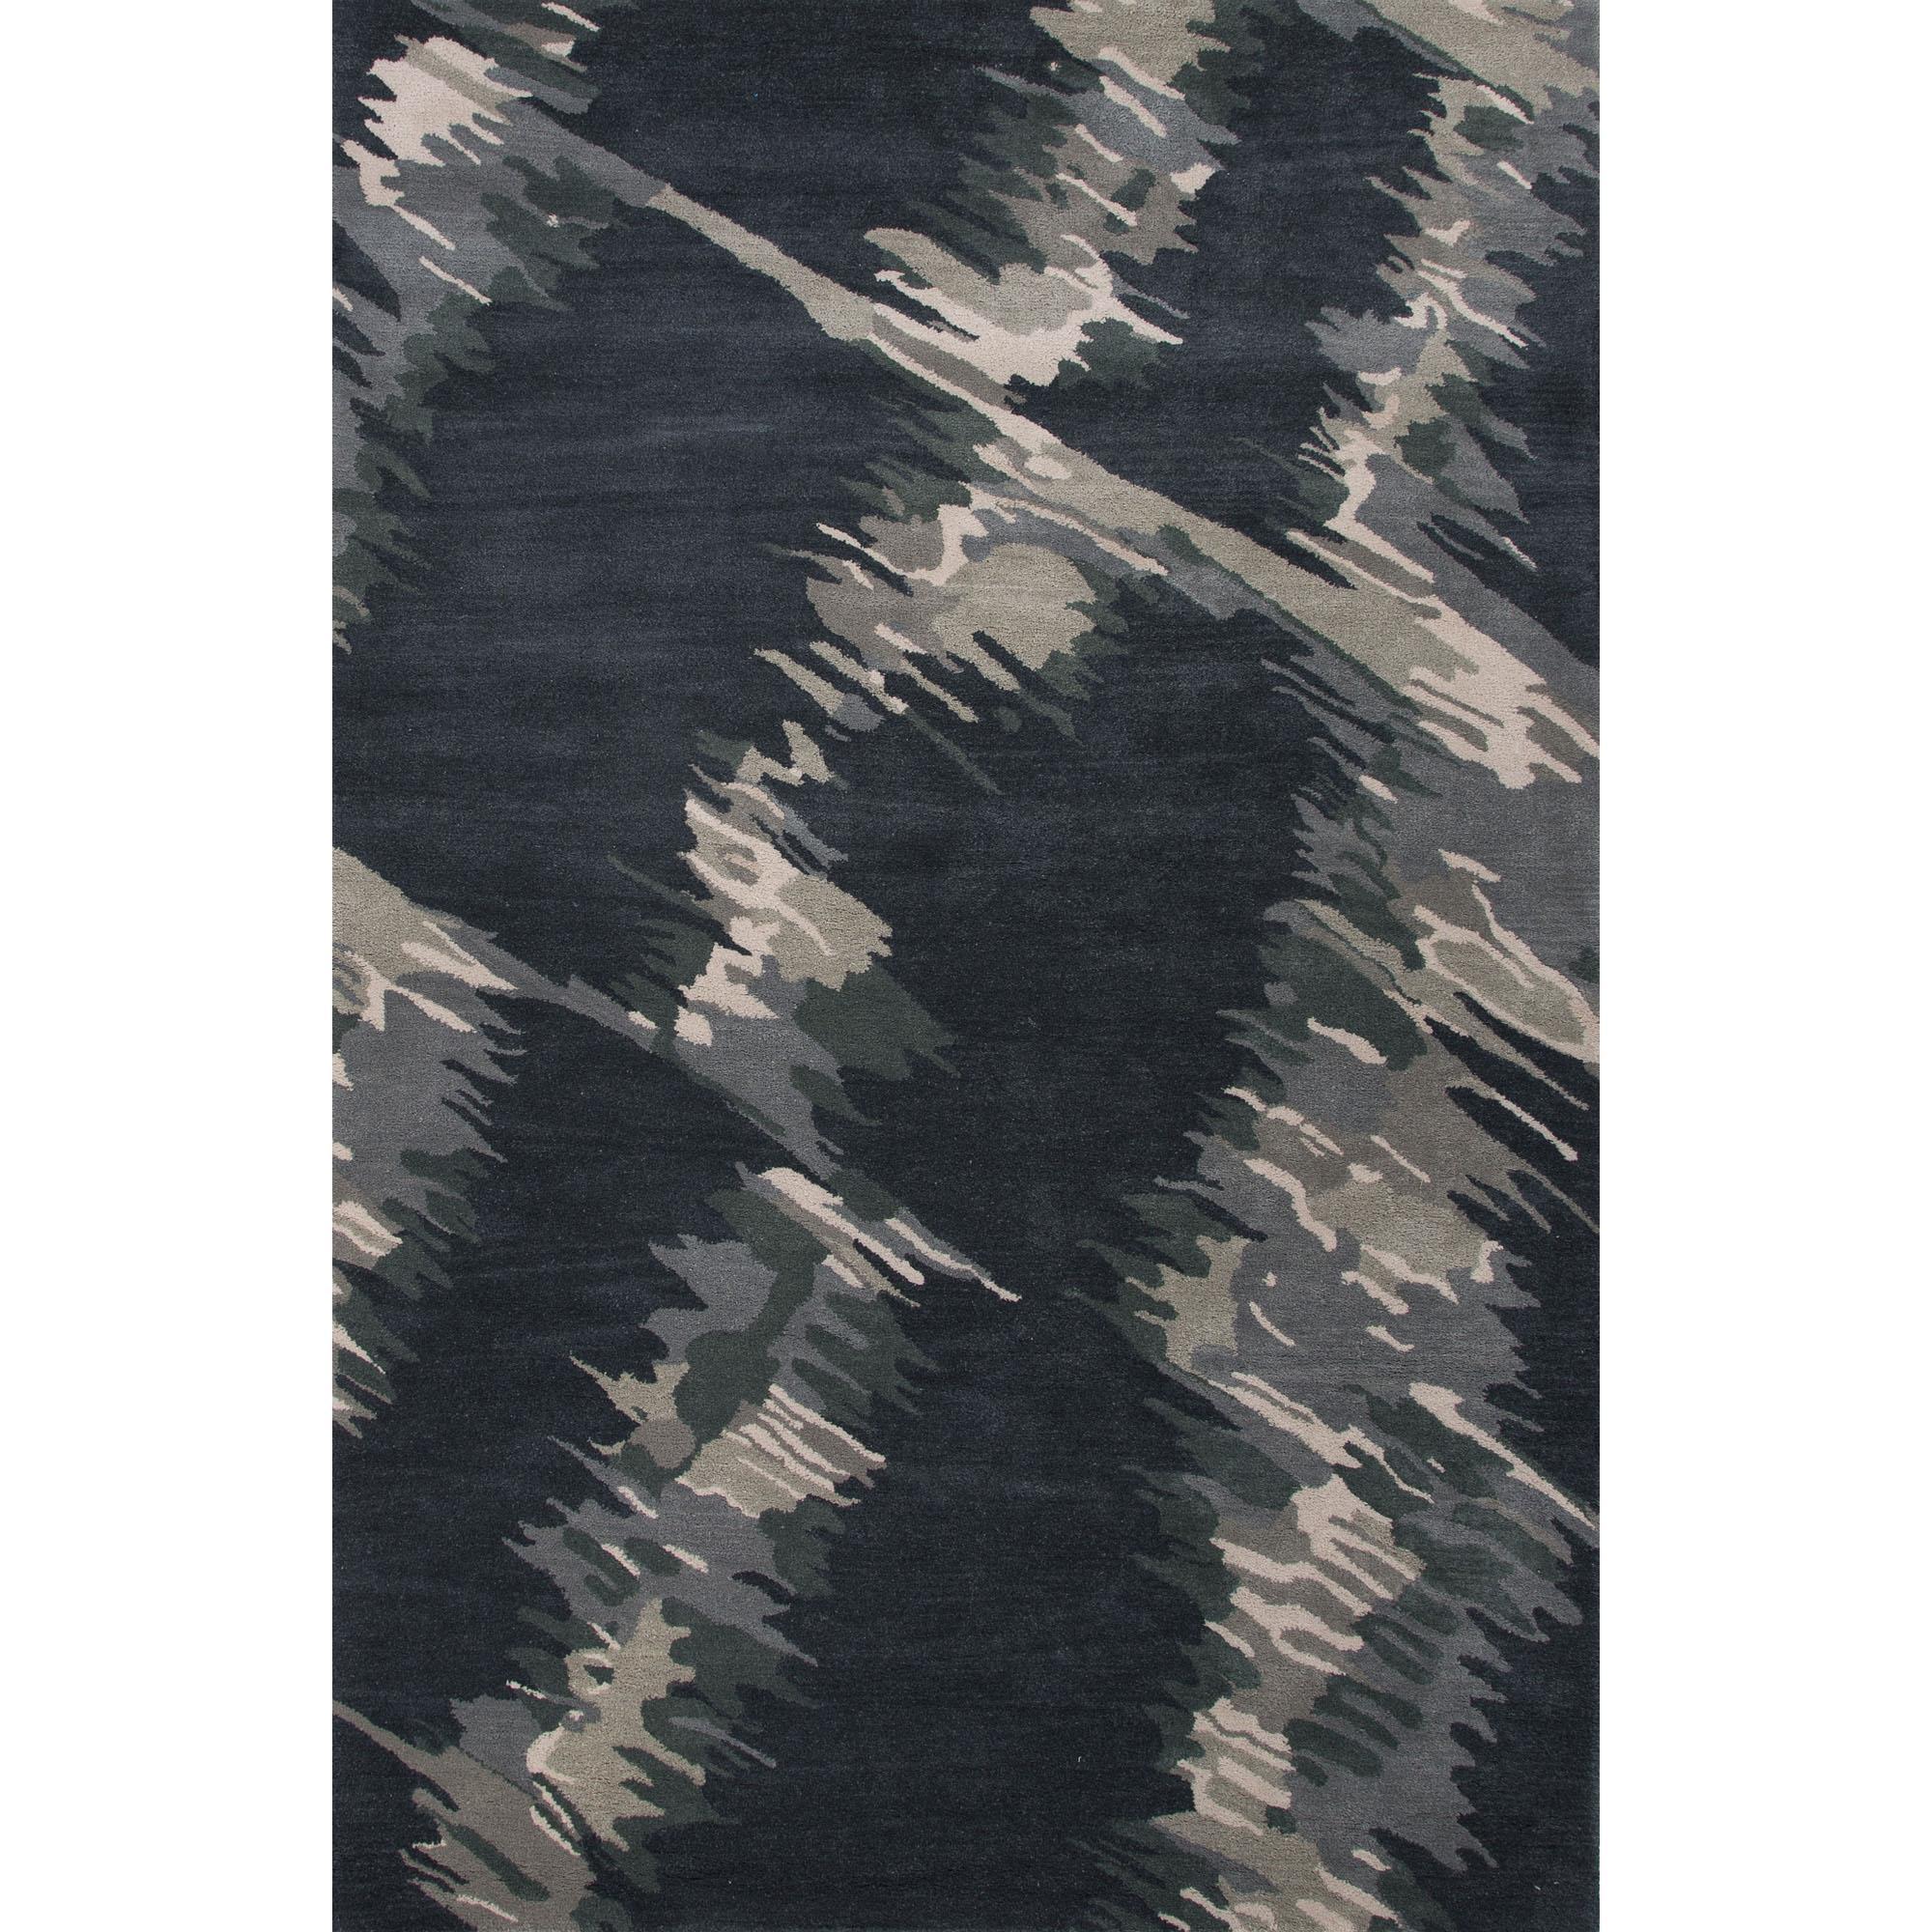 JAIPUR Rugs En Casa By Luli Sanchez Tufted 8 x 11 Rug - Item Number: RUG116773